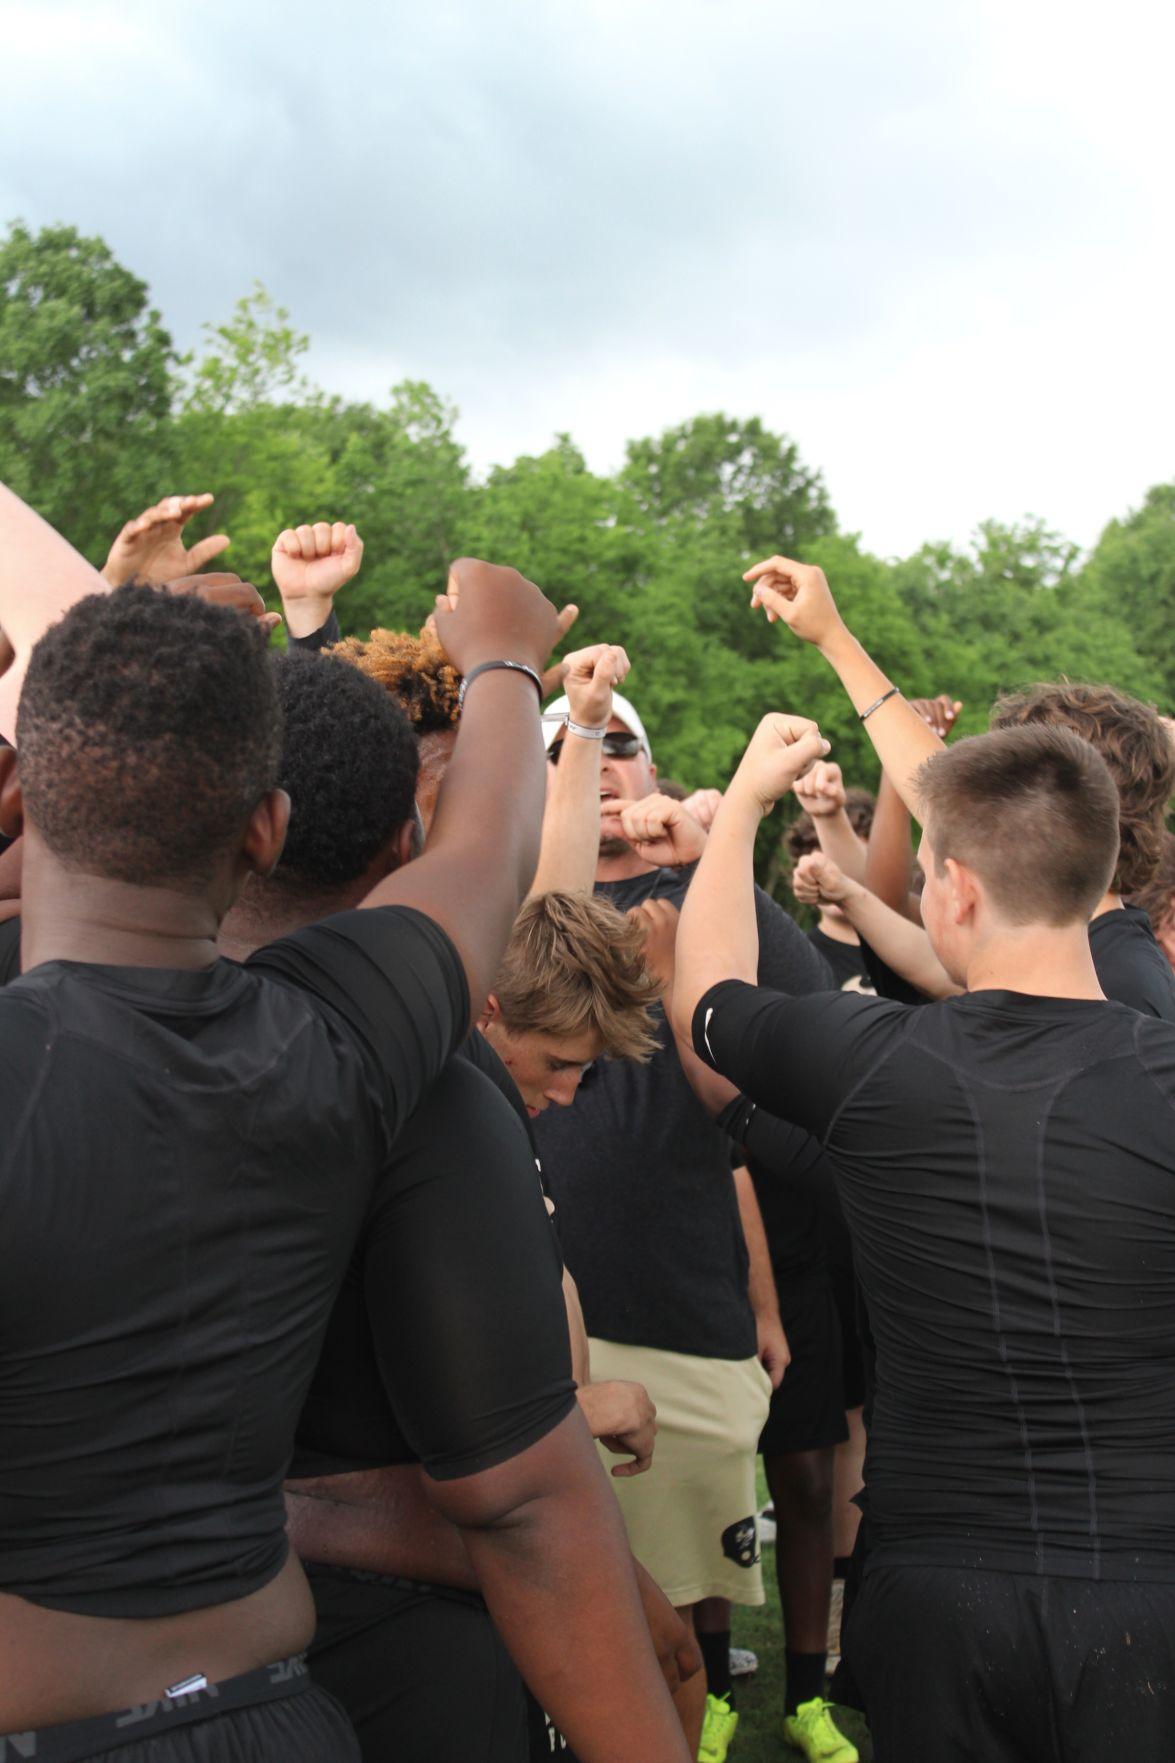 Rockmart football gets going for spring | Georgia News